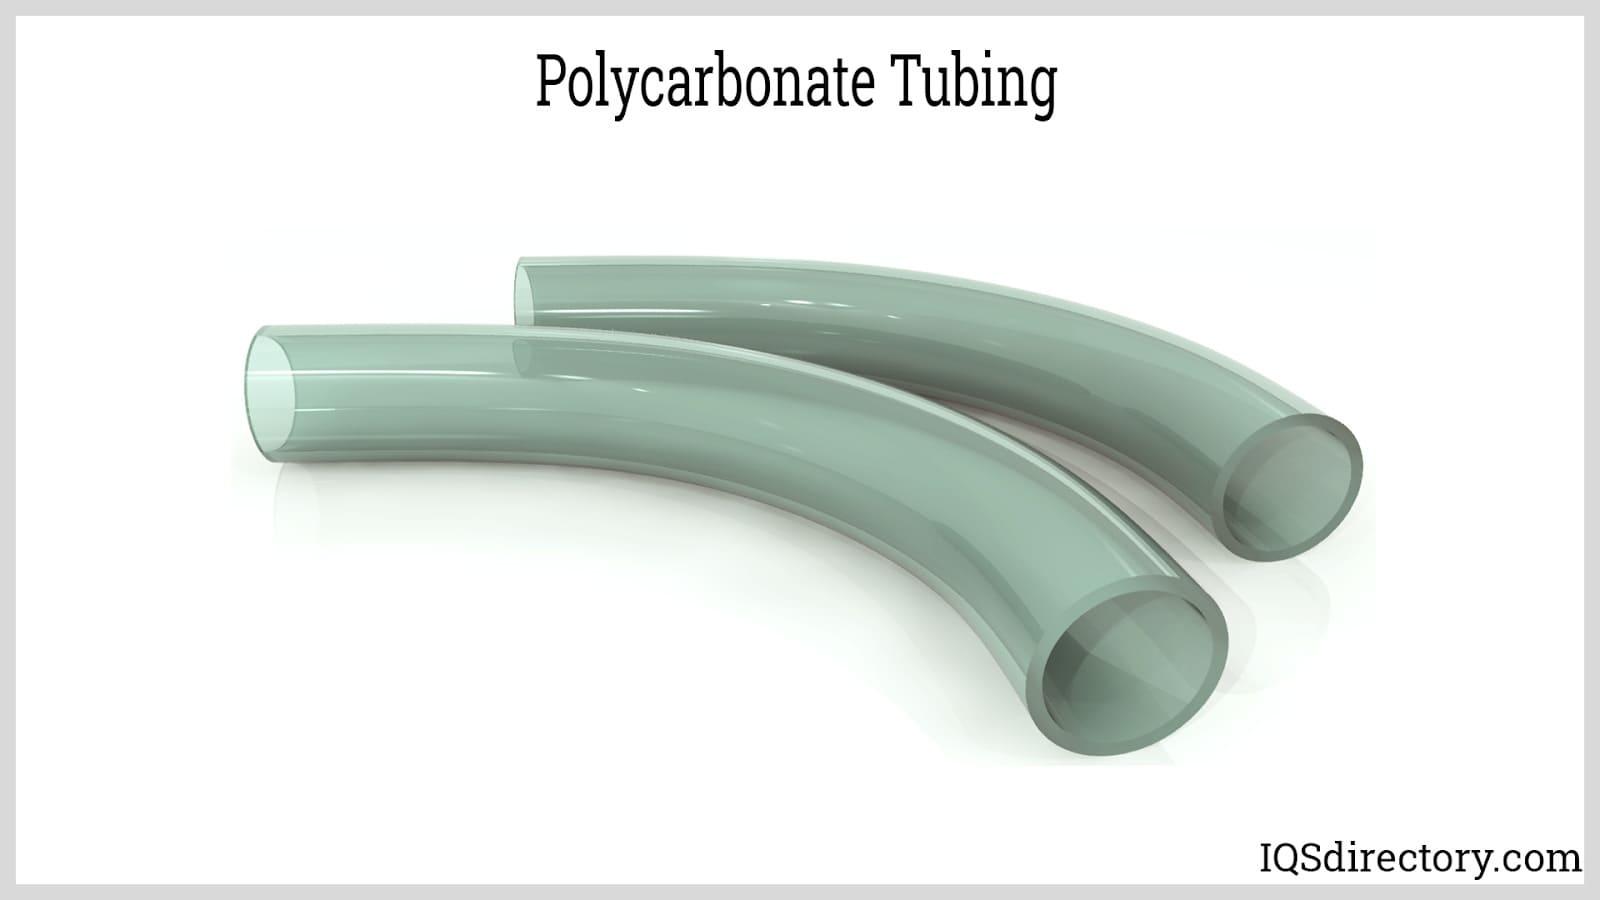 Polycarbonate Tubing